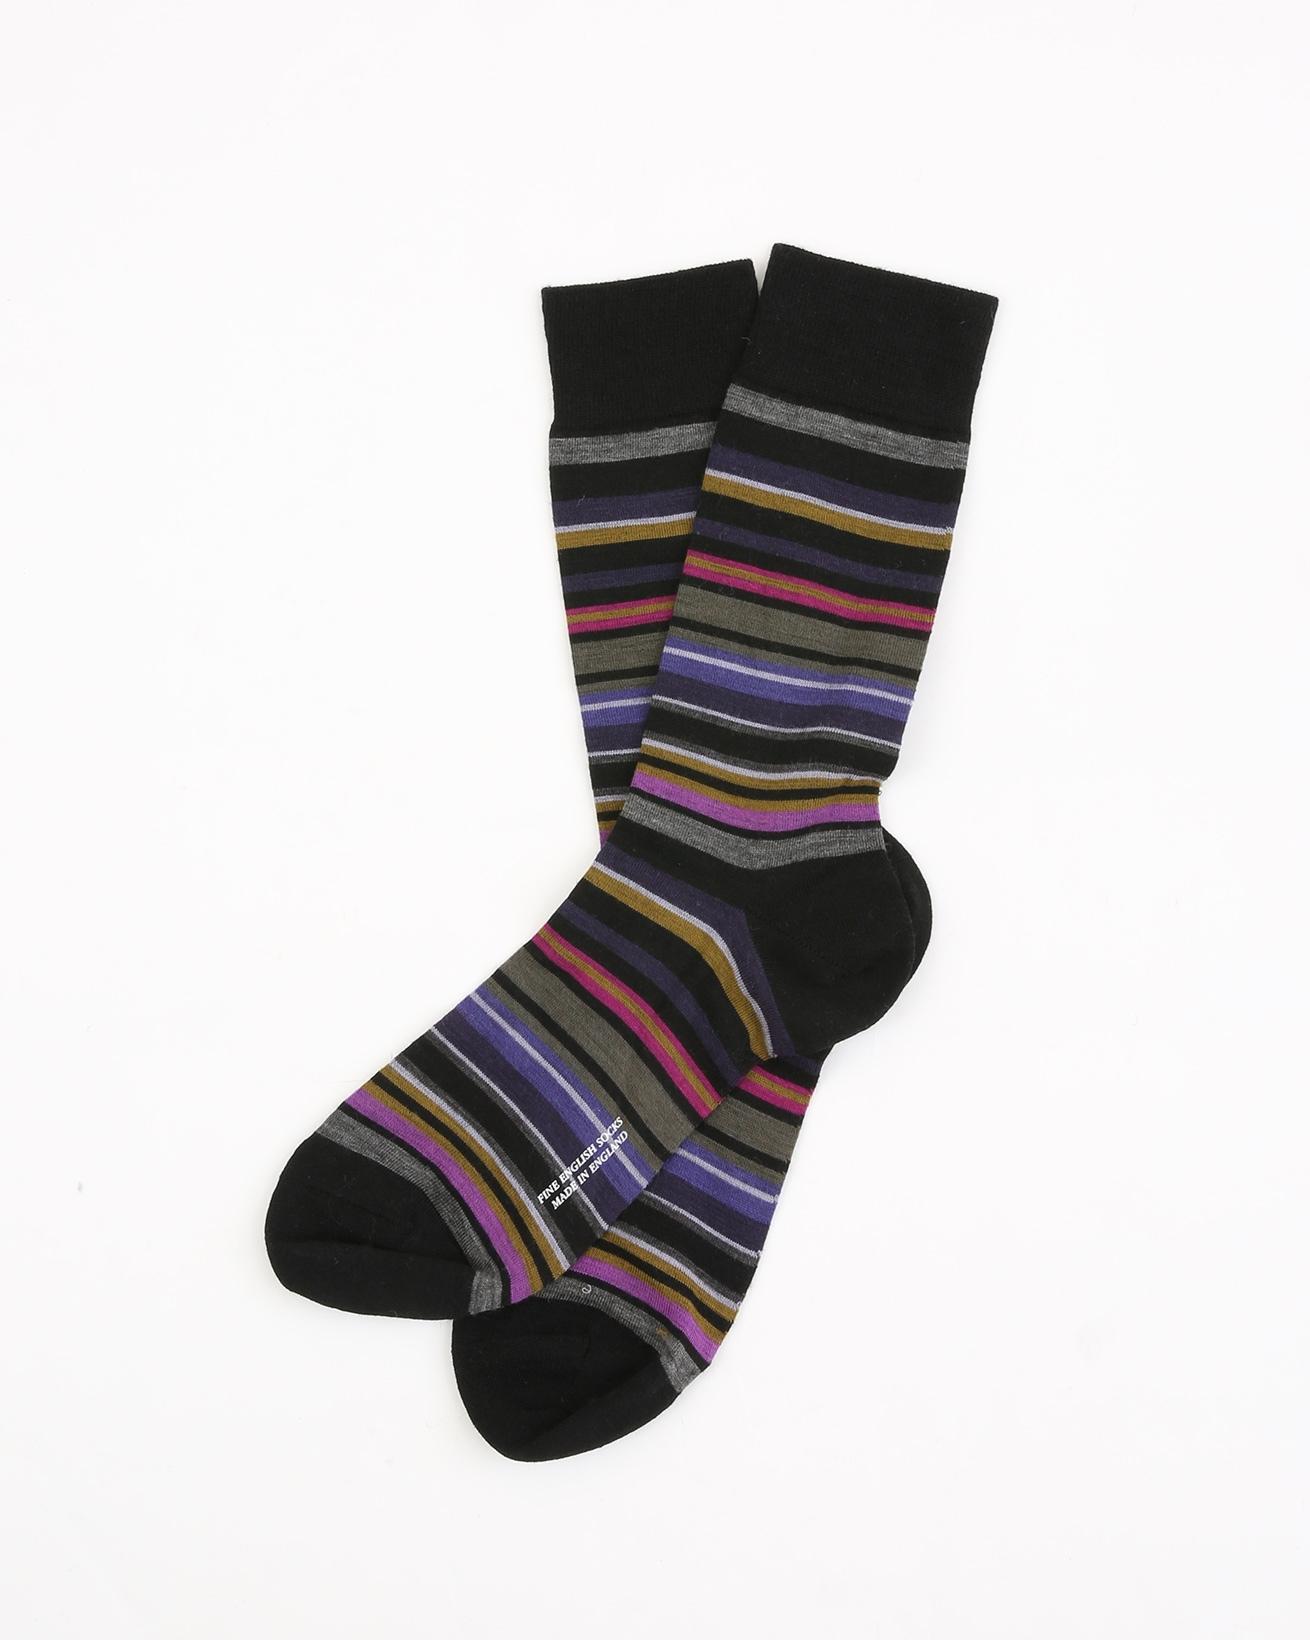 Mens Fine Merino Sock - Size Medium 7.5-9.5 - Black Multi - 1961